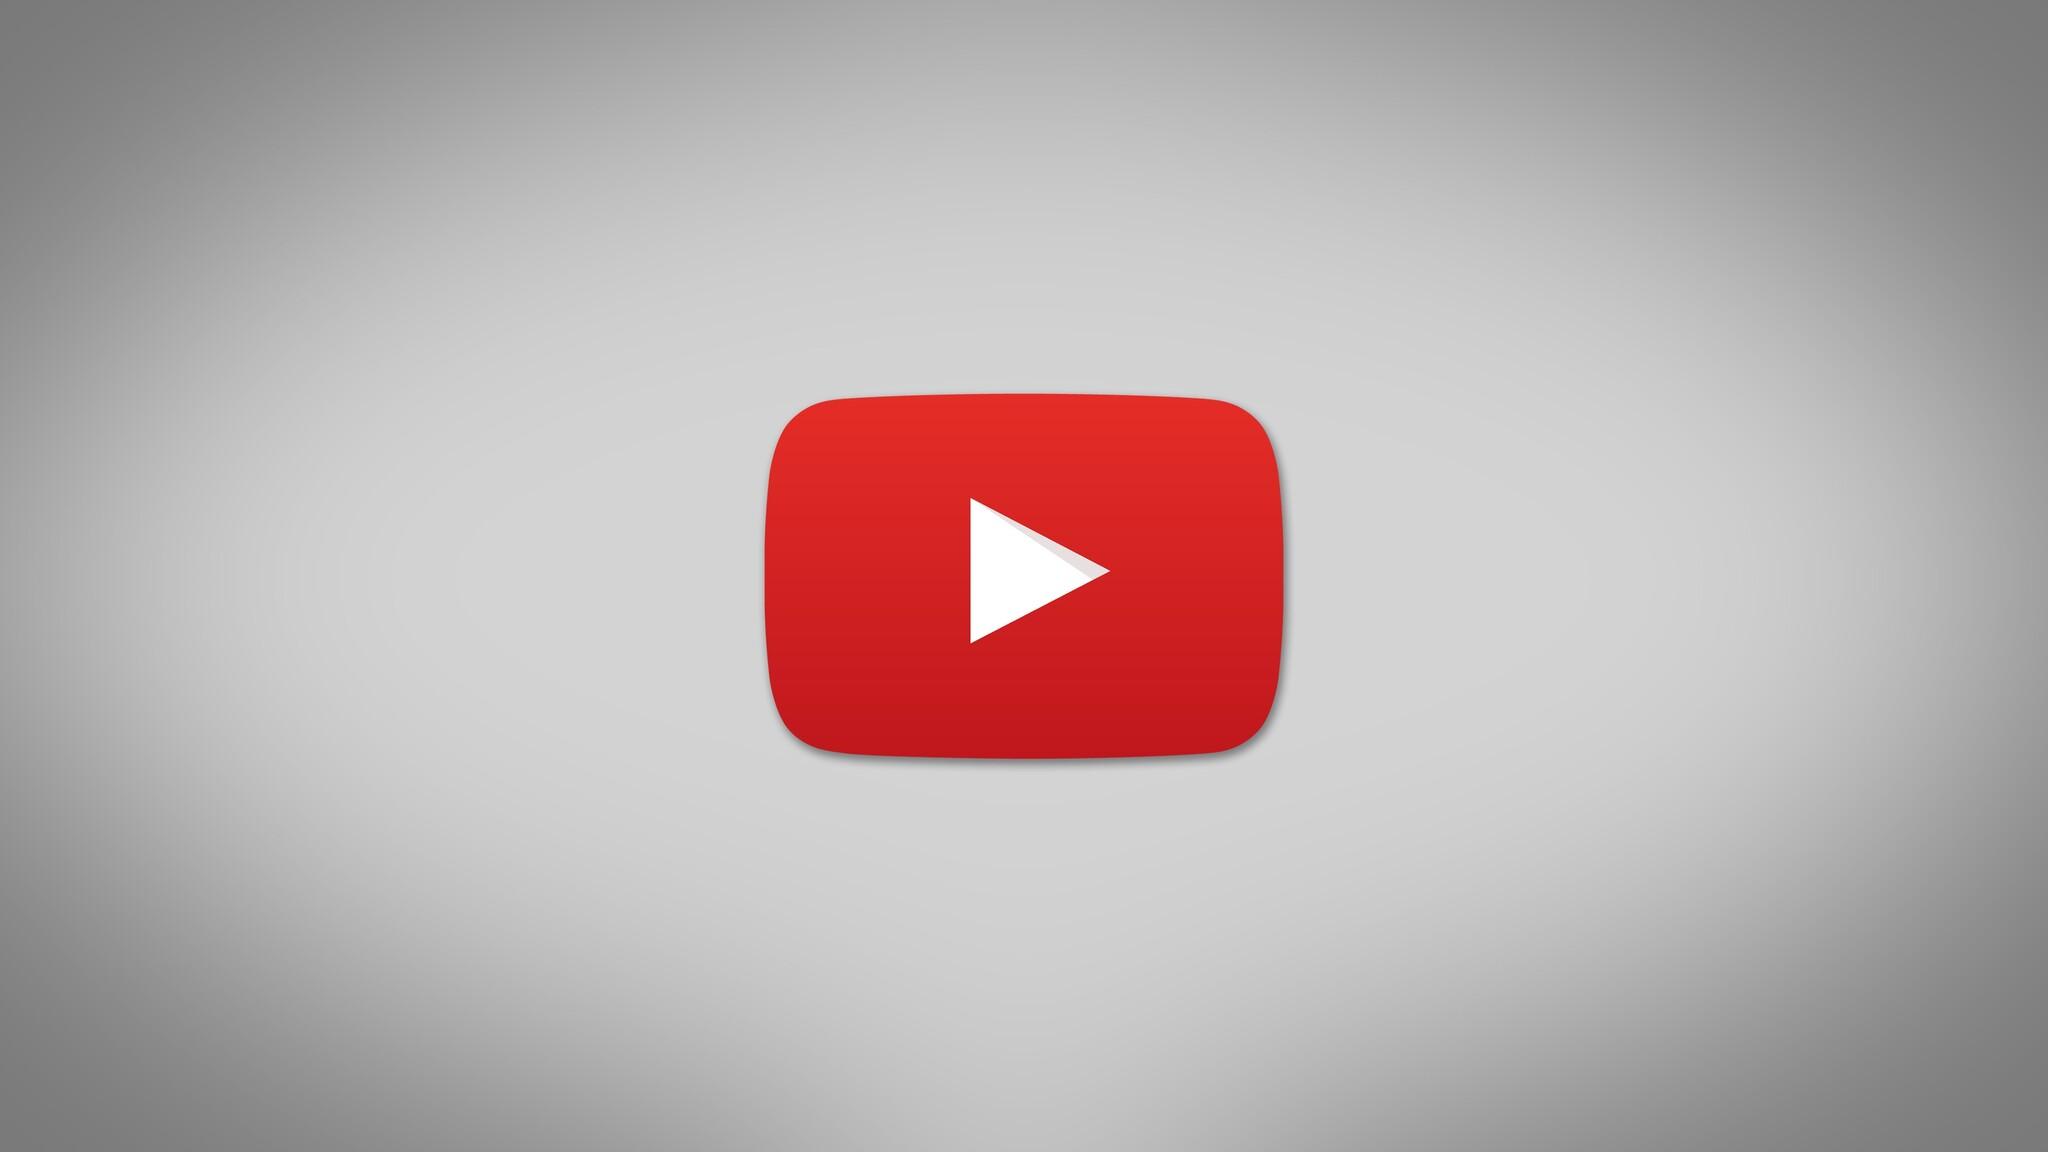 2048x1152 Youtube Original Logo In 4k 2048x1152 Resolution